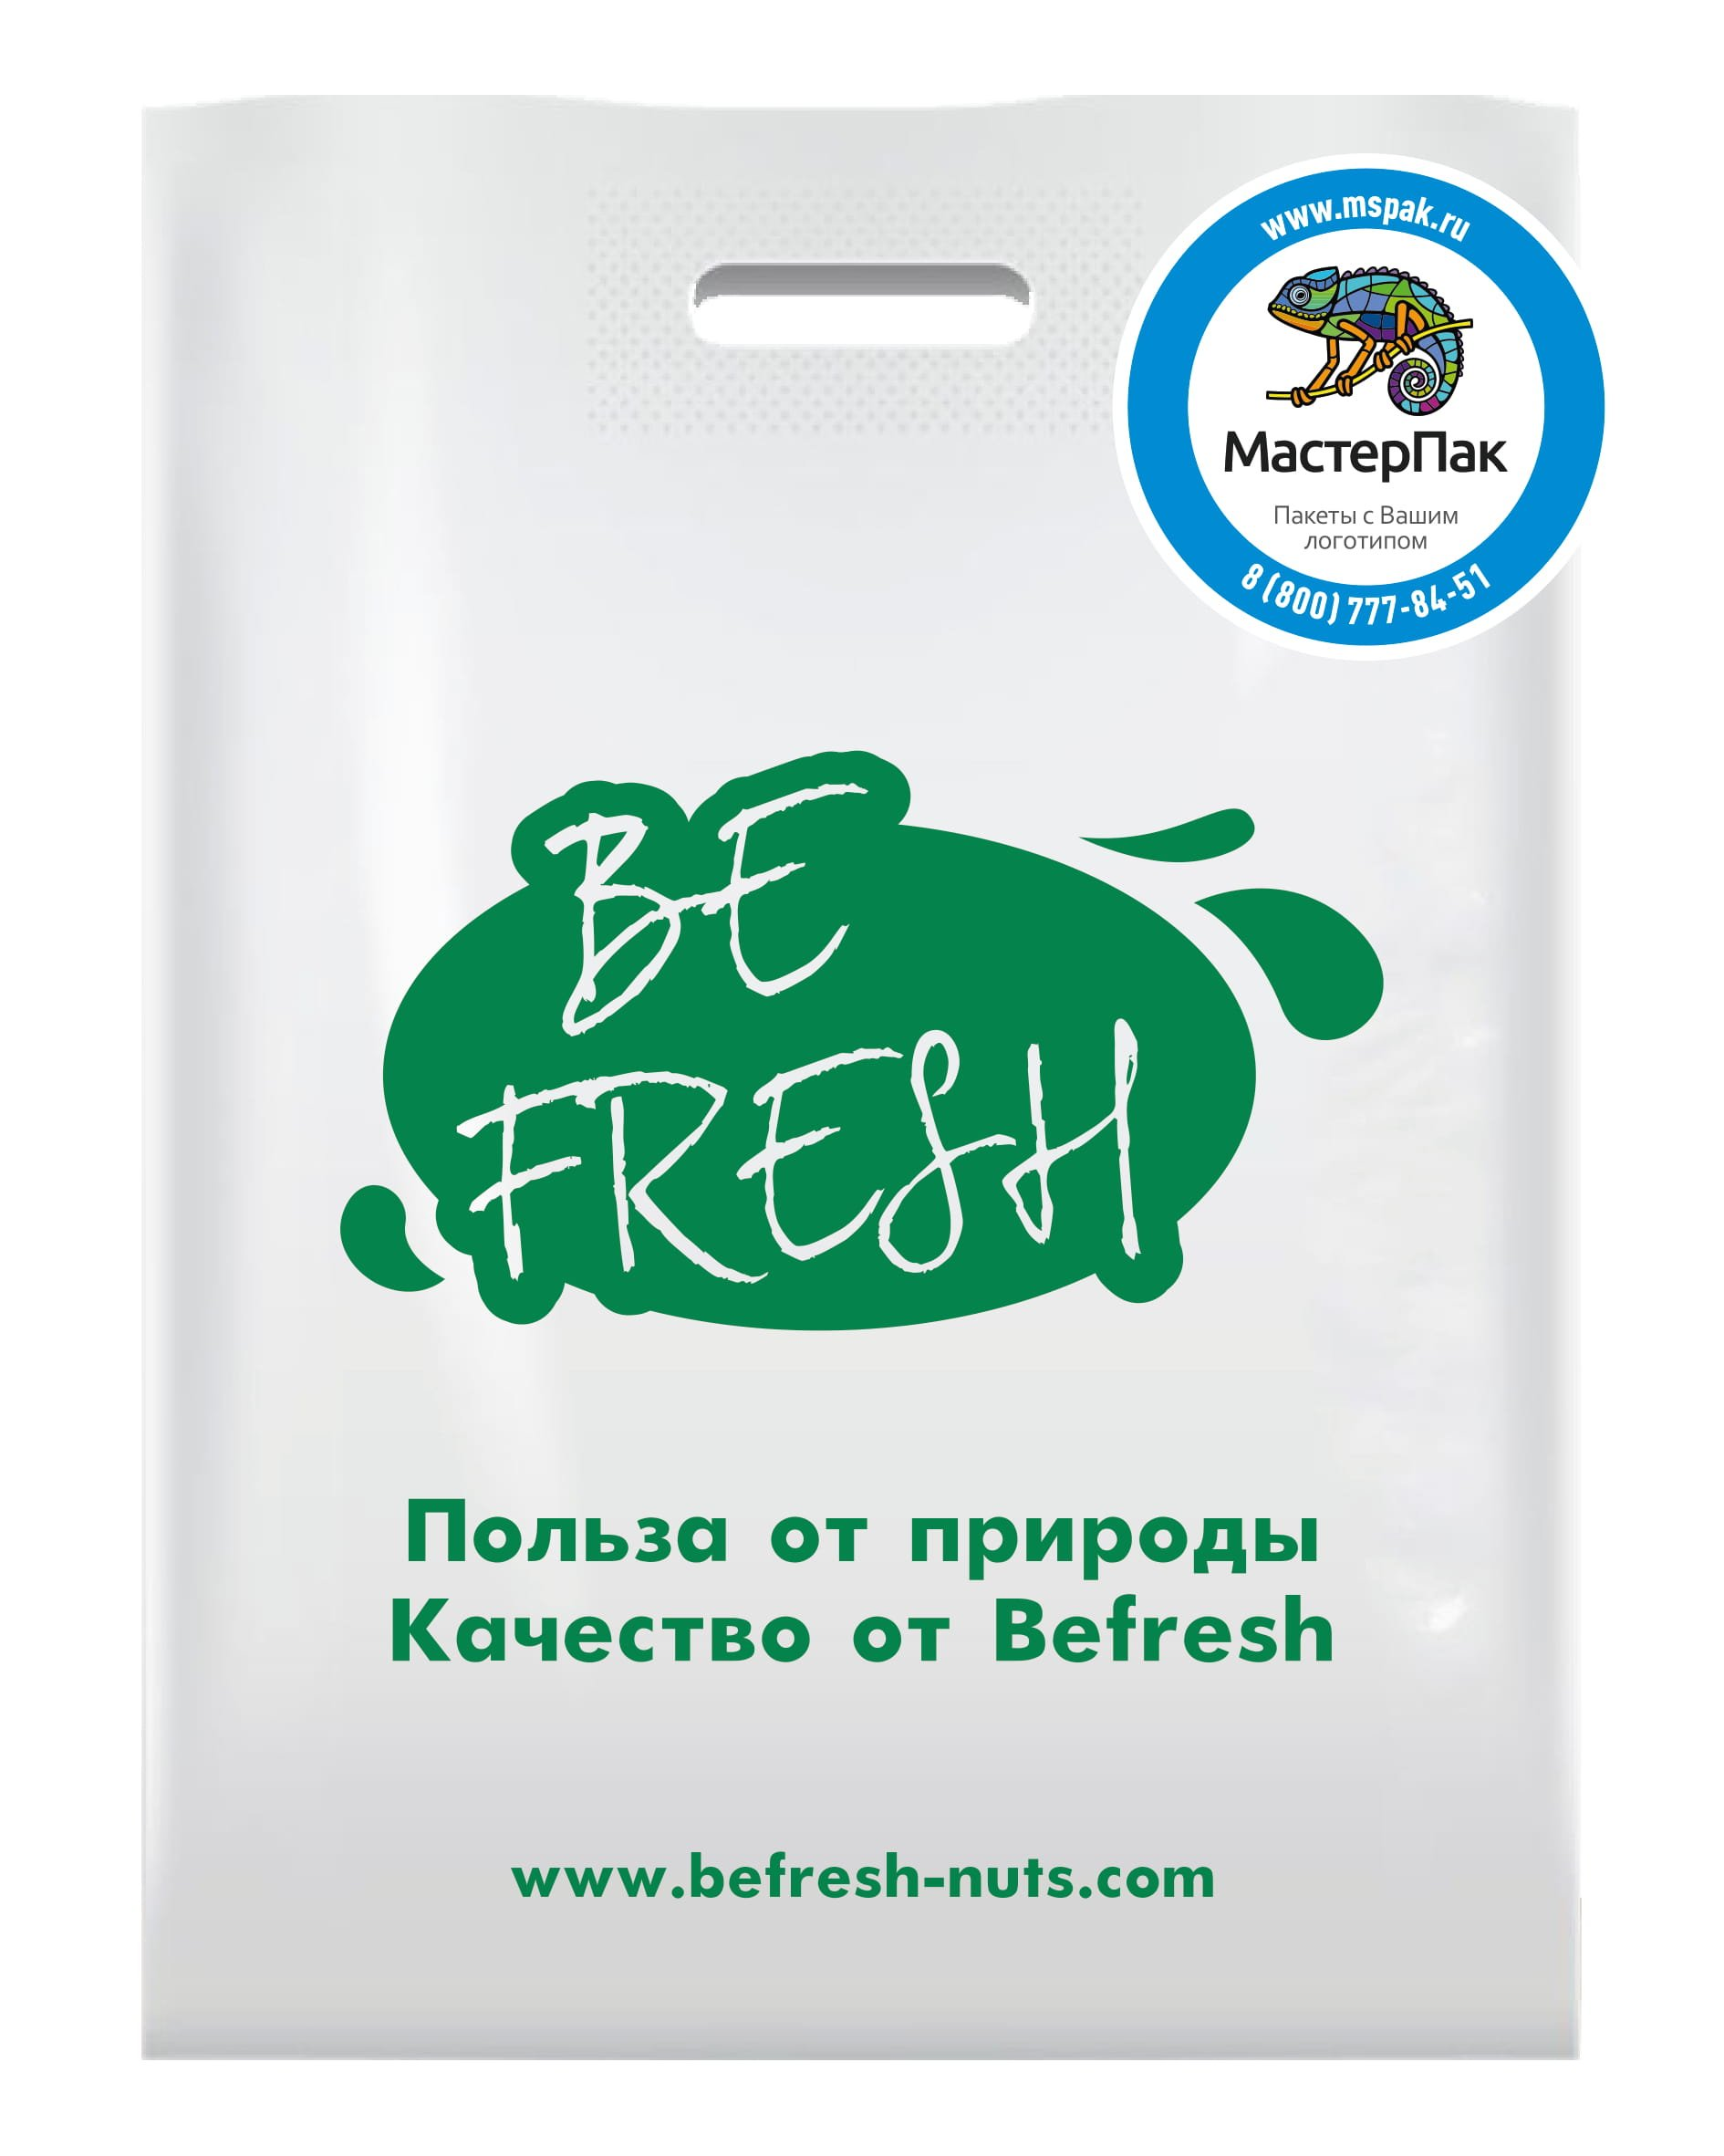 Пакет ПВД с логотипом Be Fresh, Иркутск, 70 мкм, 30*40, белый